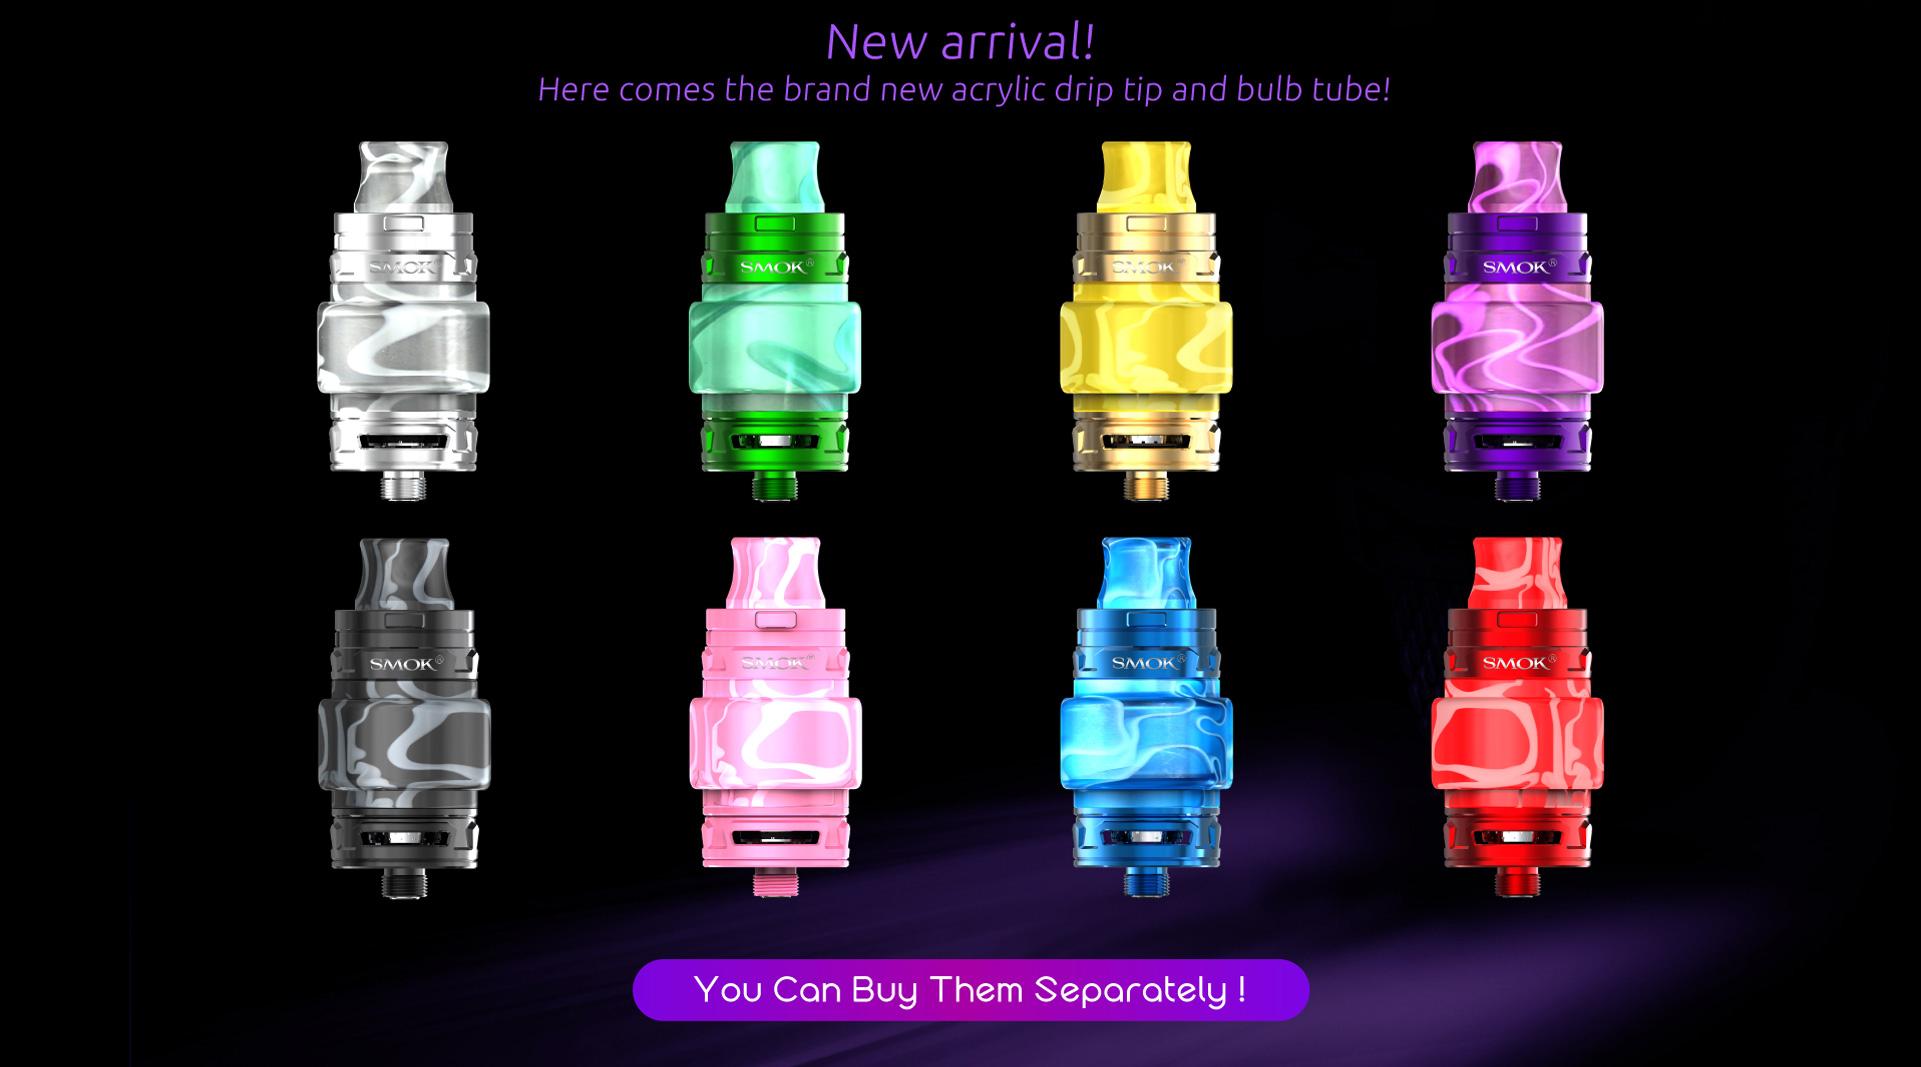 Smok Tfv12 Baby Prince Tank With 4 5ml Capacity And Light